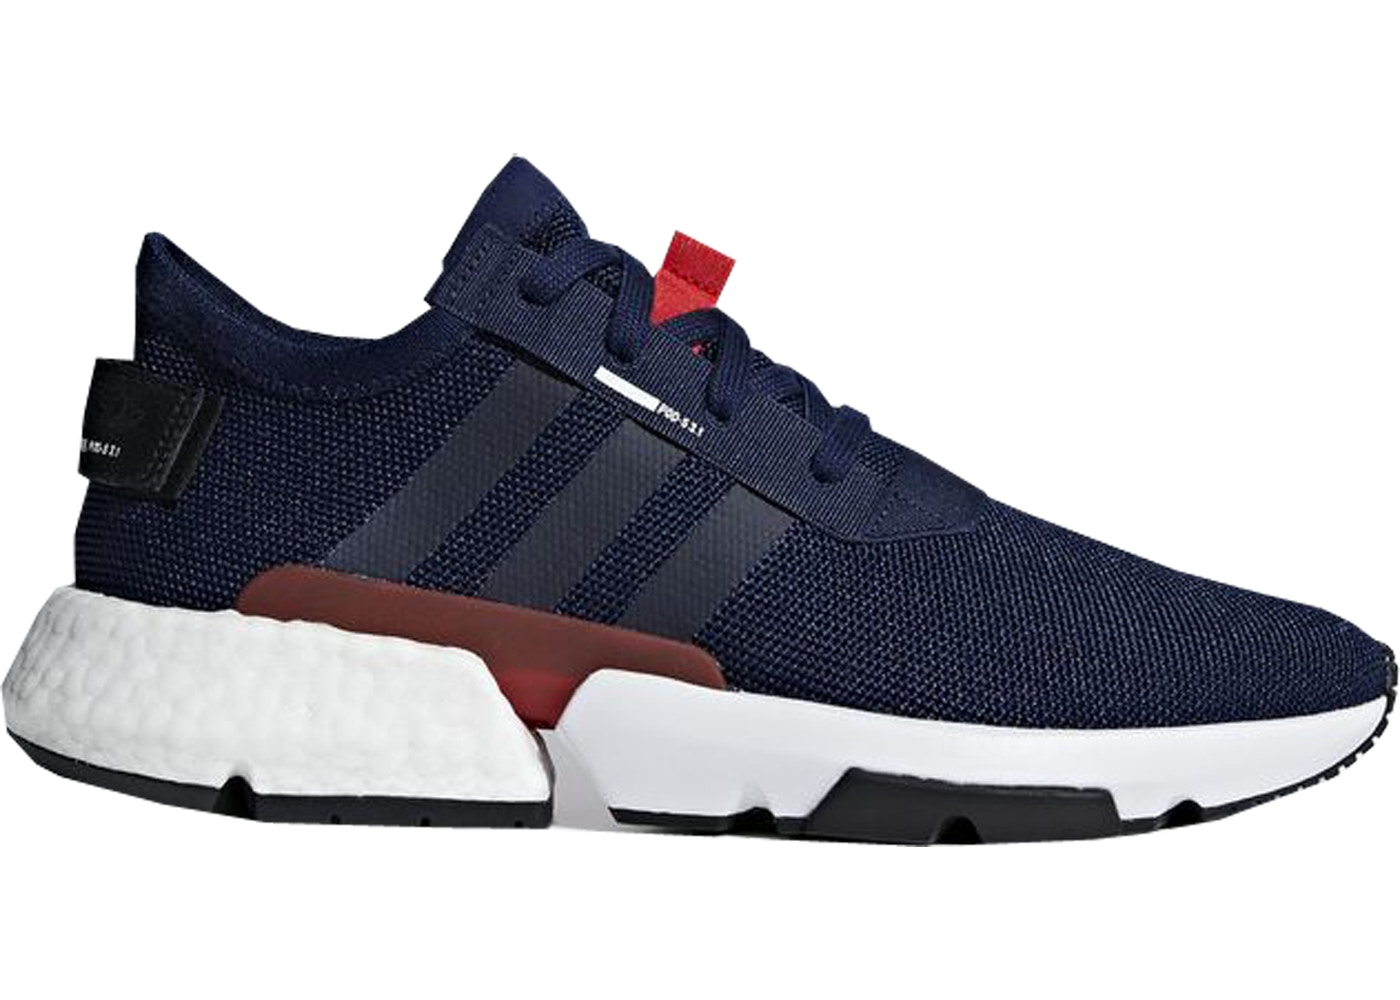 adidas POD-S3.1 Blue Red - G26512